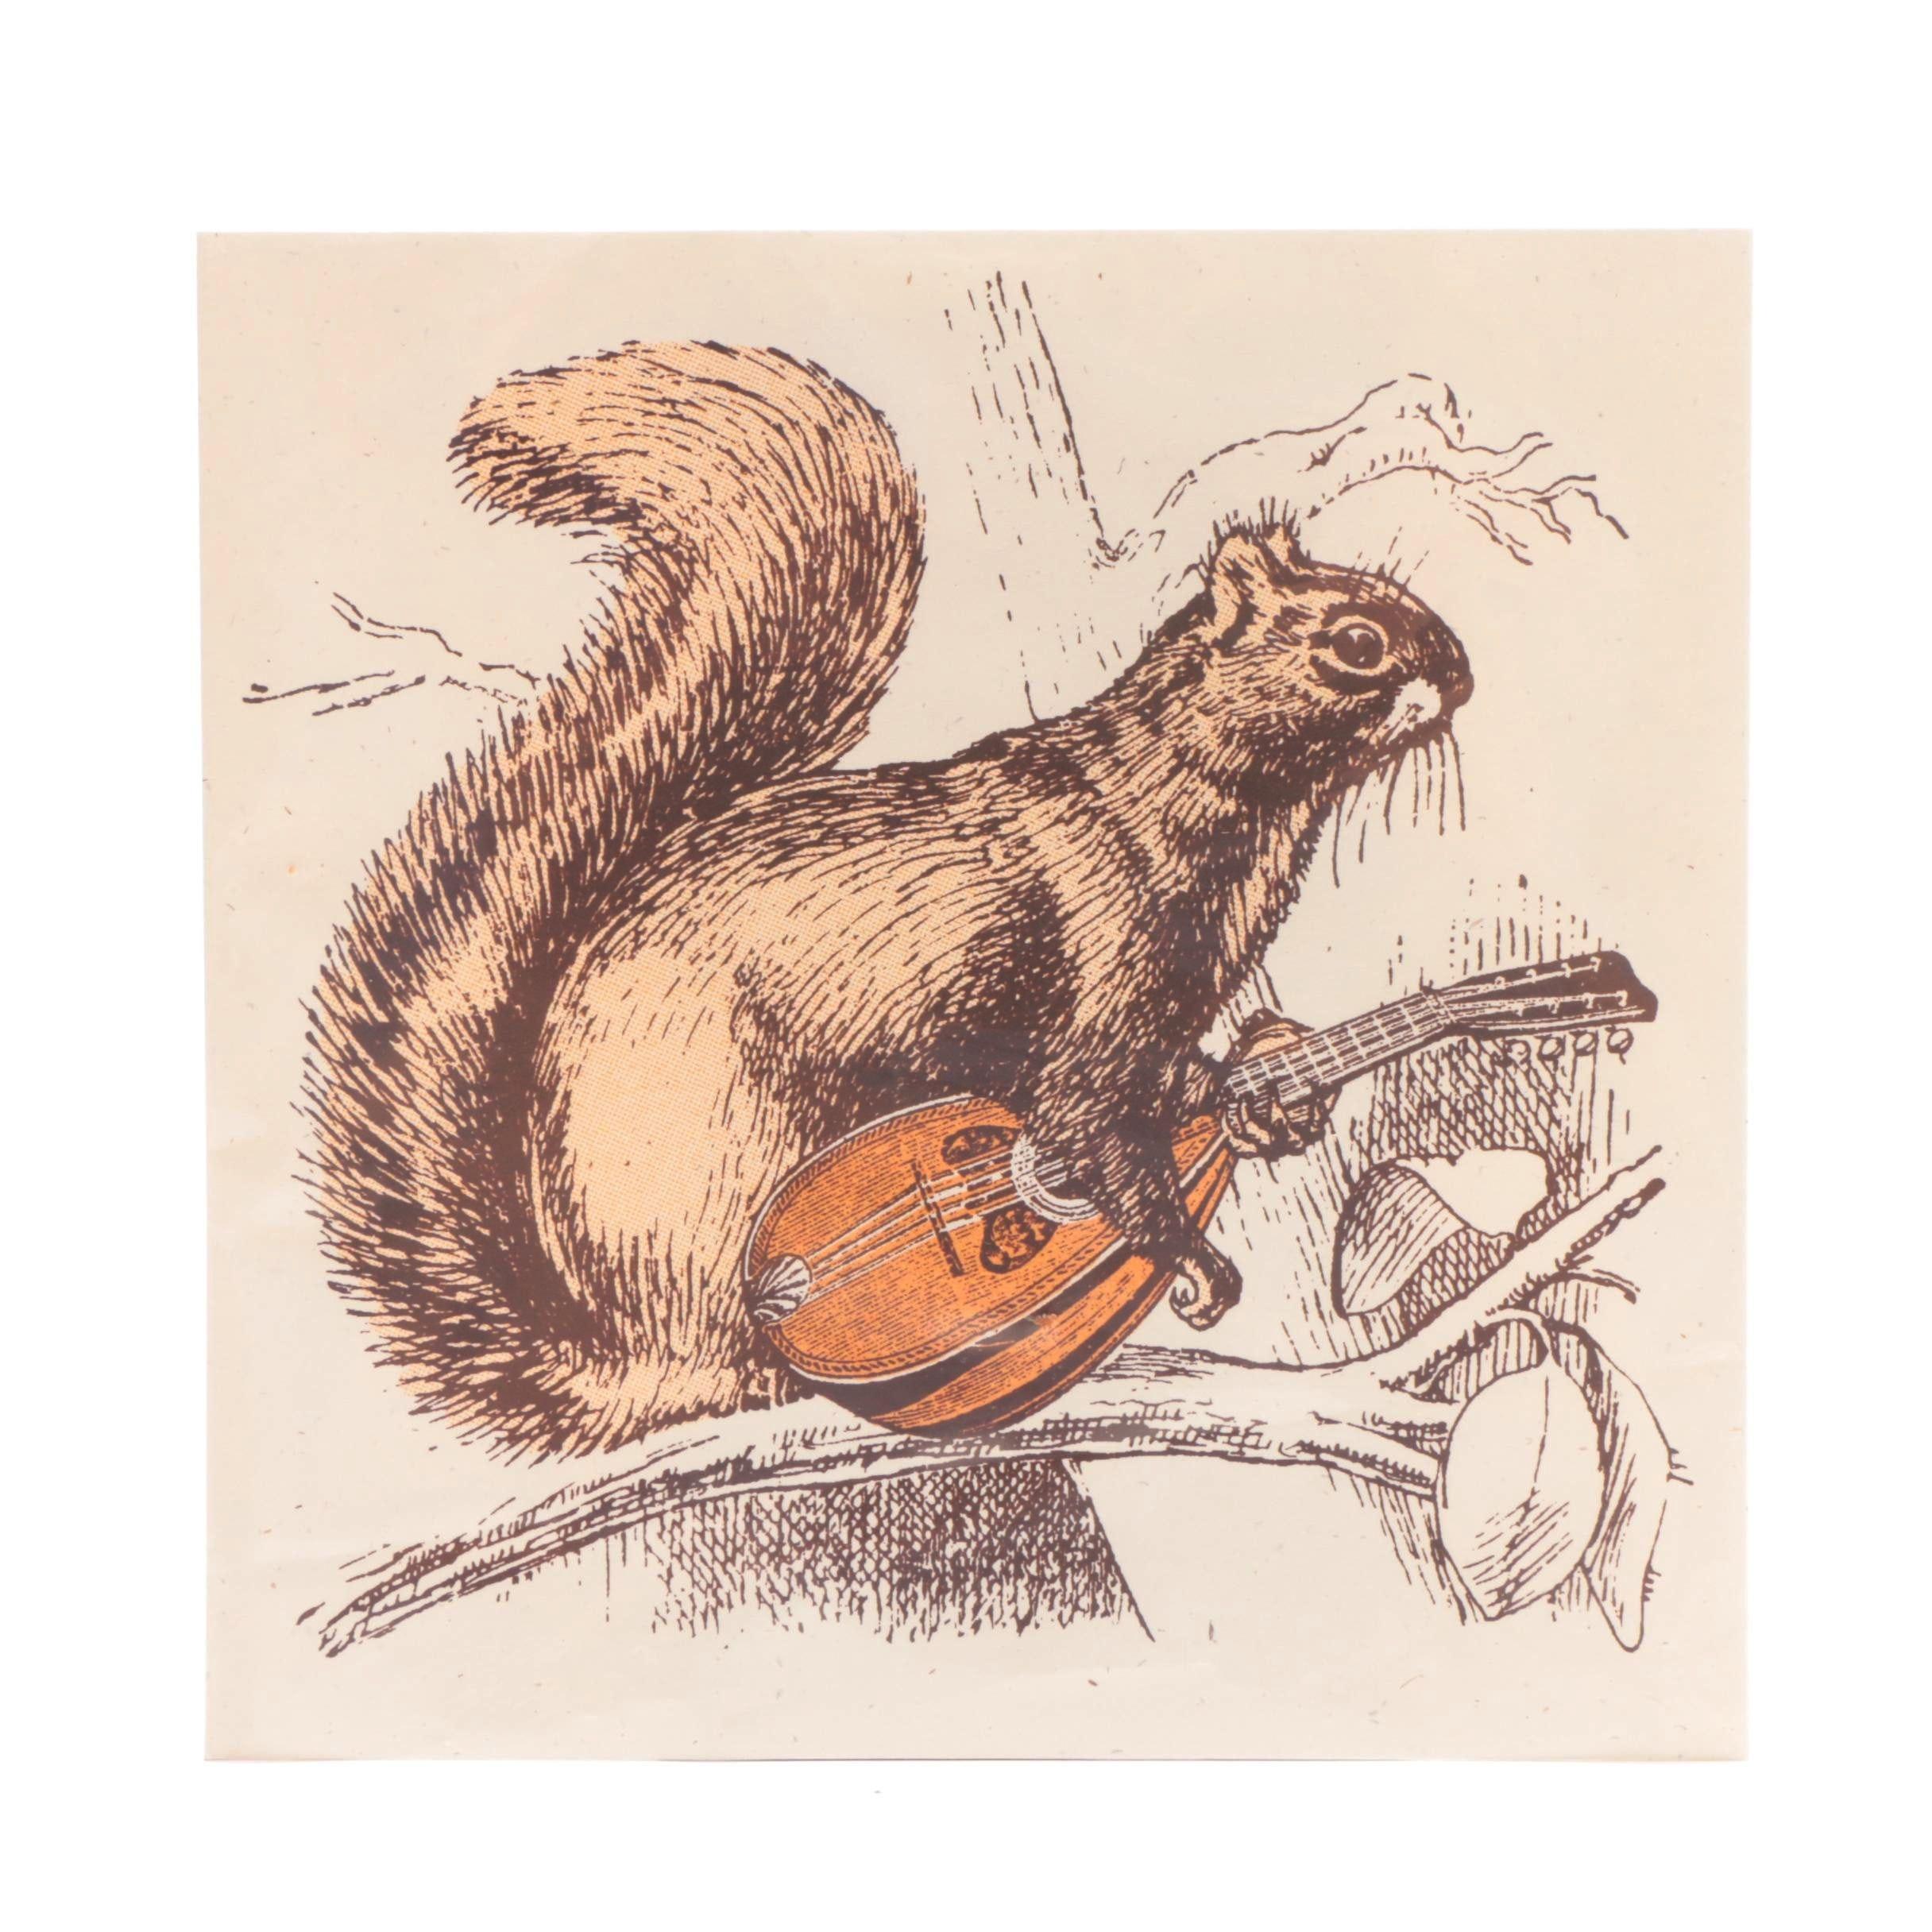 Nate Duval Serigraph Print of Squirrel with Mandolin